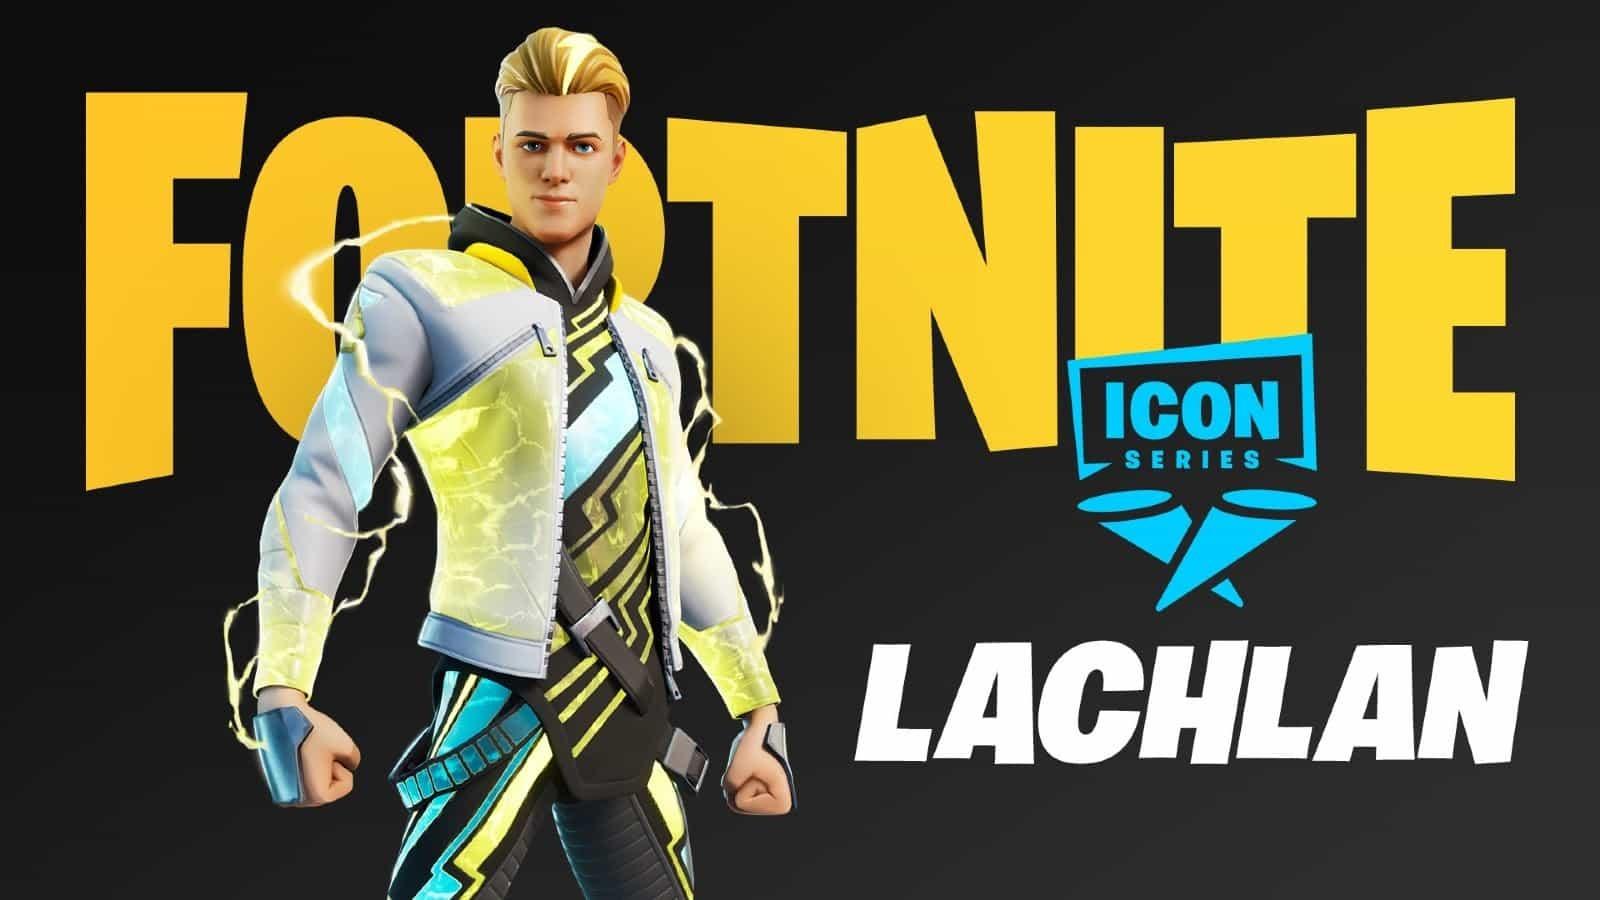 Skin Lachlan Fortnite Icon Series